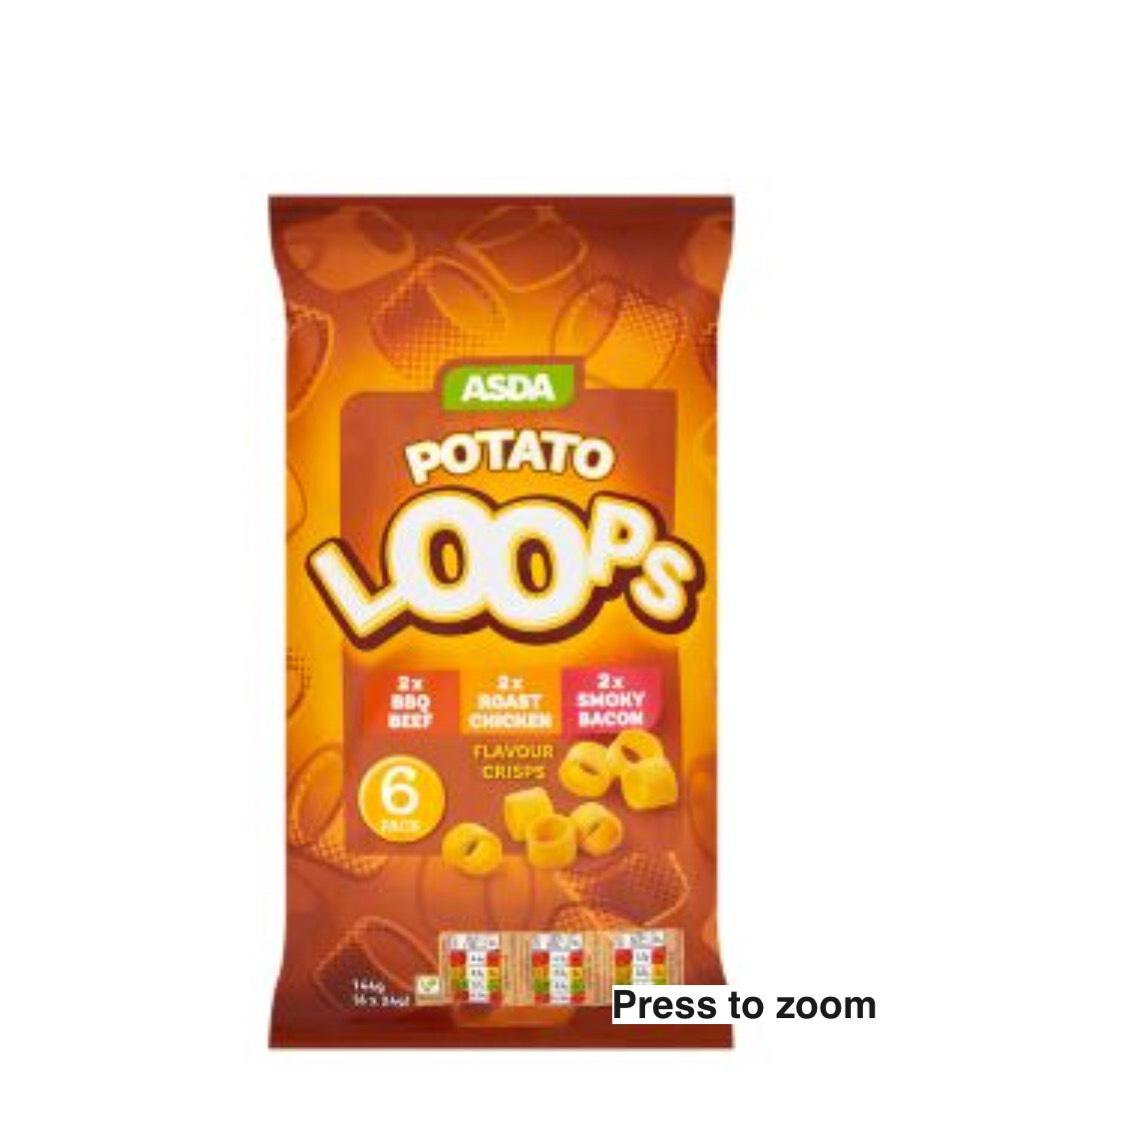 Asda potato loops 6 pack 43p